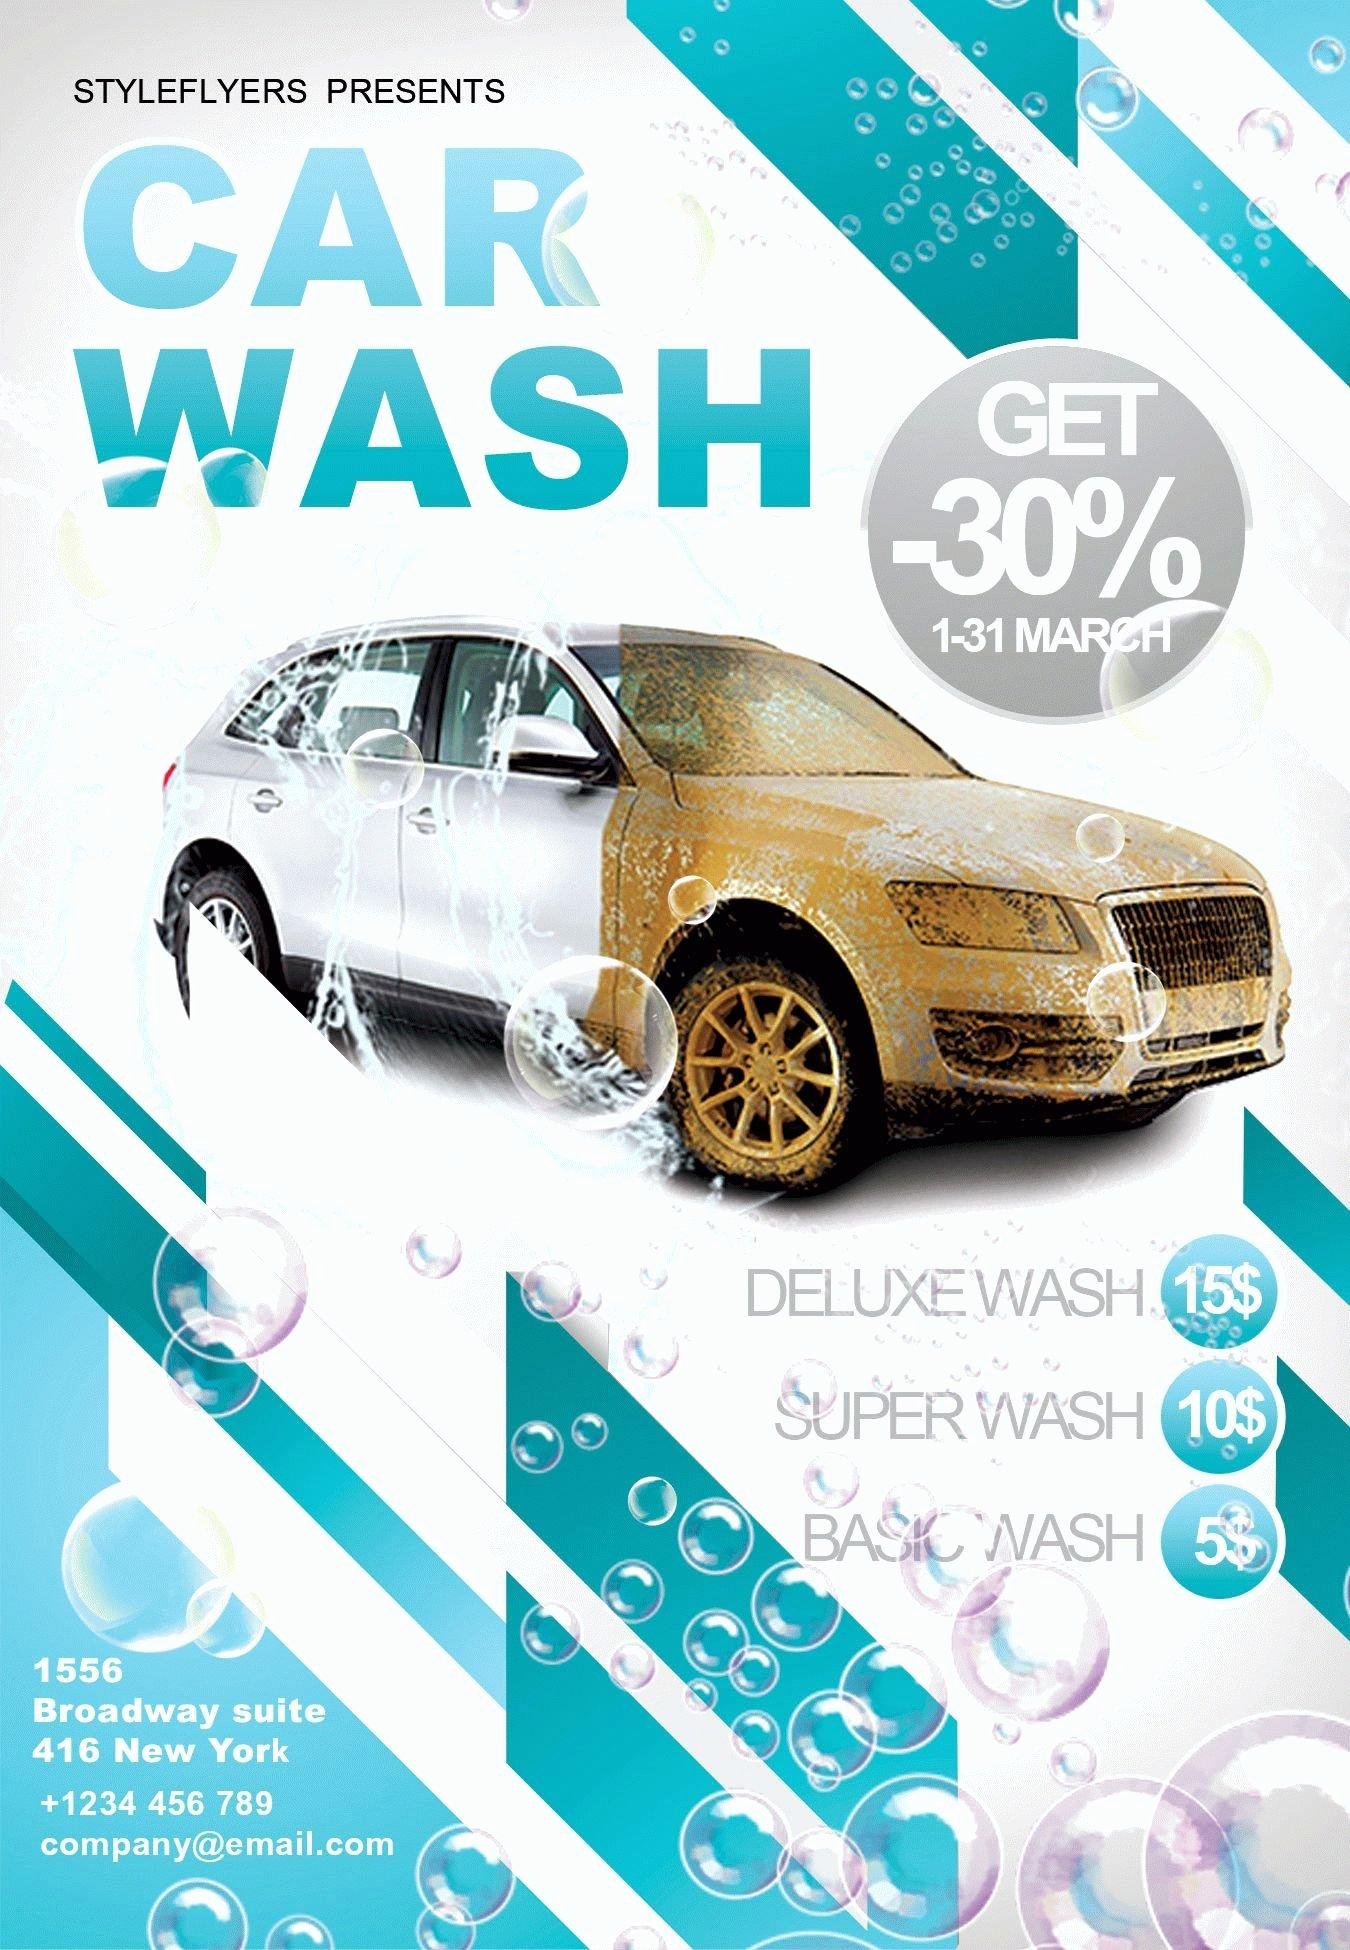 Car Wash Flyer Template Free Unique Car Wash Psd Flyer Template